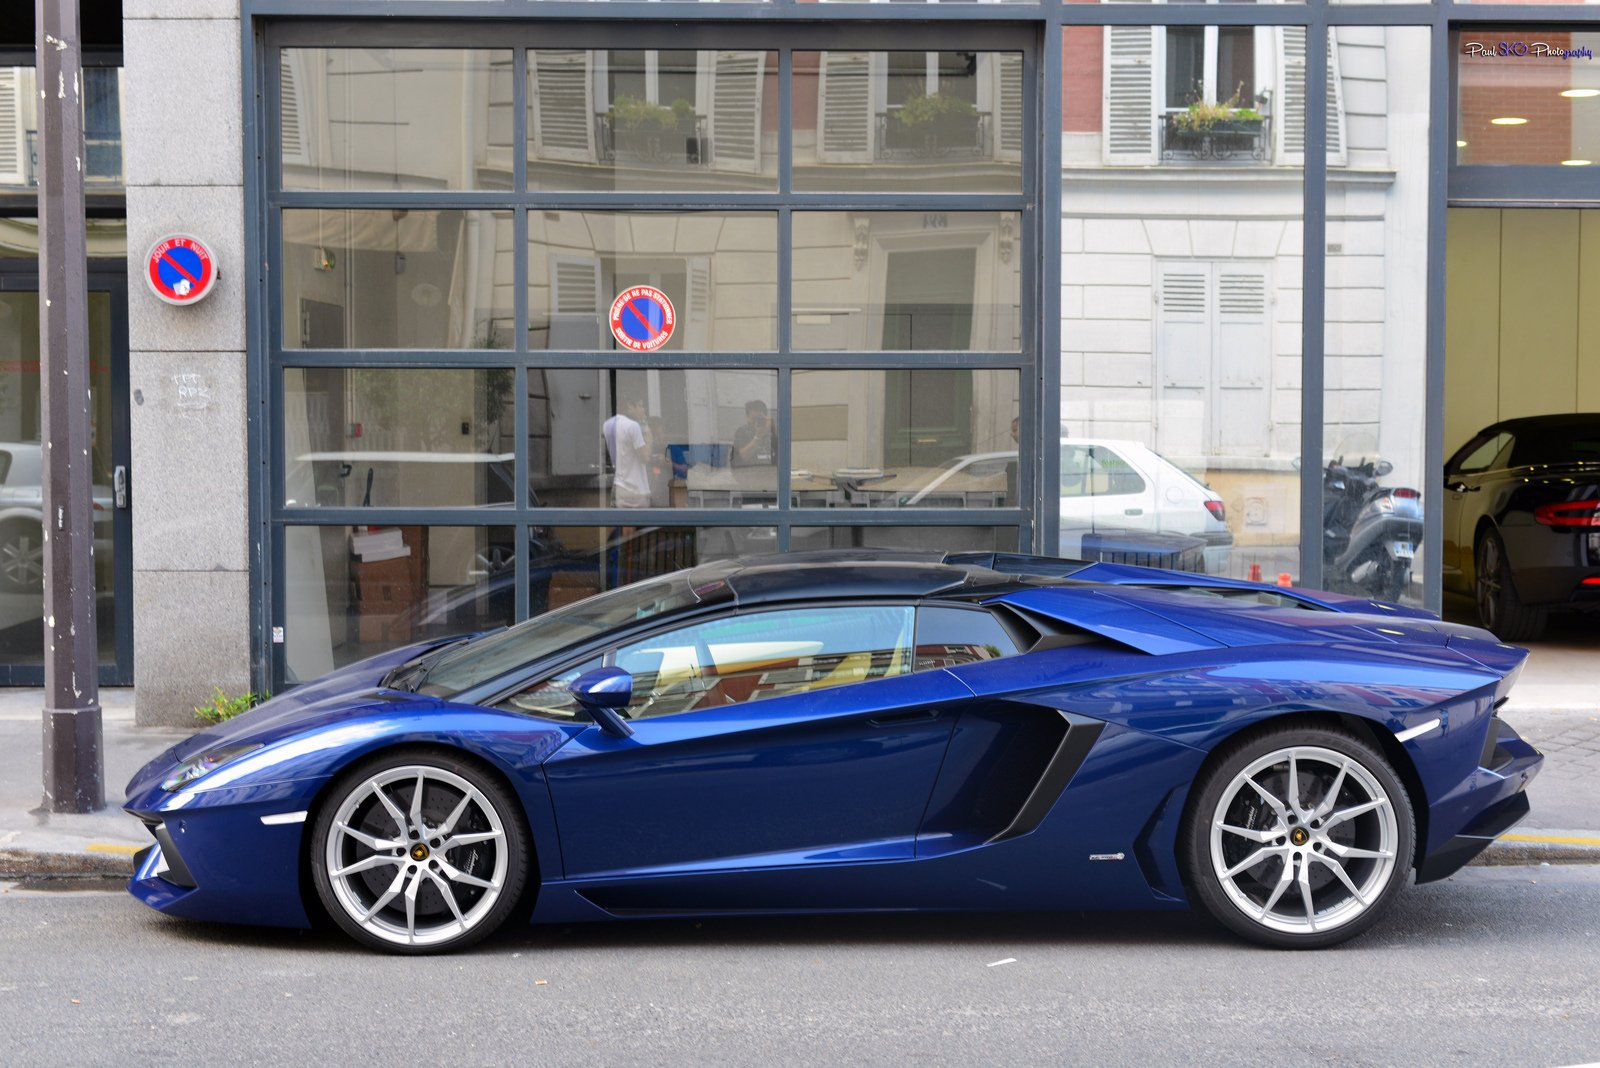 A Beautiful Dark Blue Lamborghini Aventador Roadster With A Bright